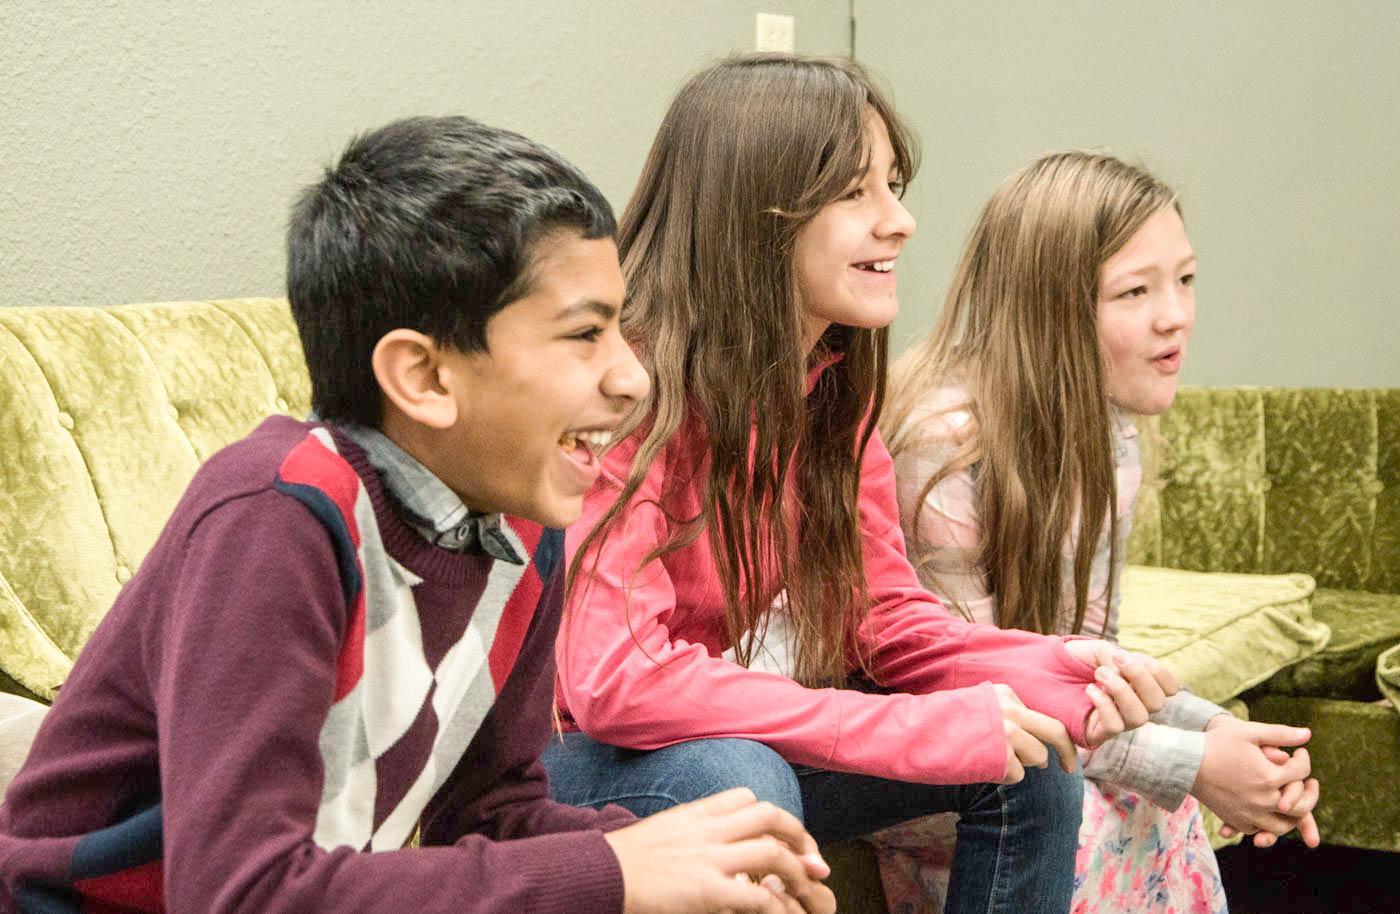 Church Programs for Kids